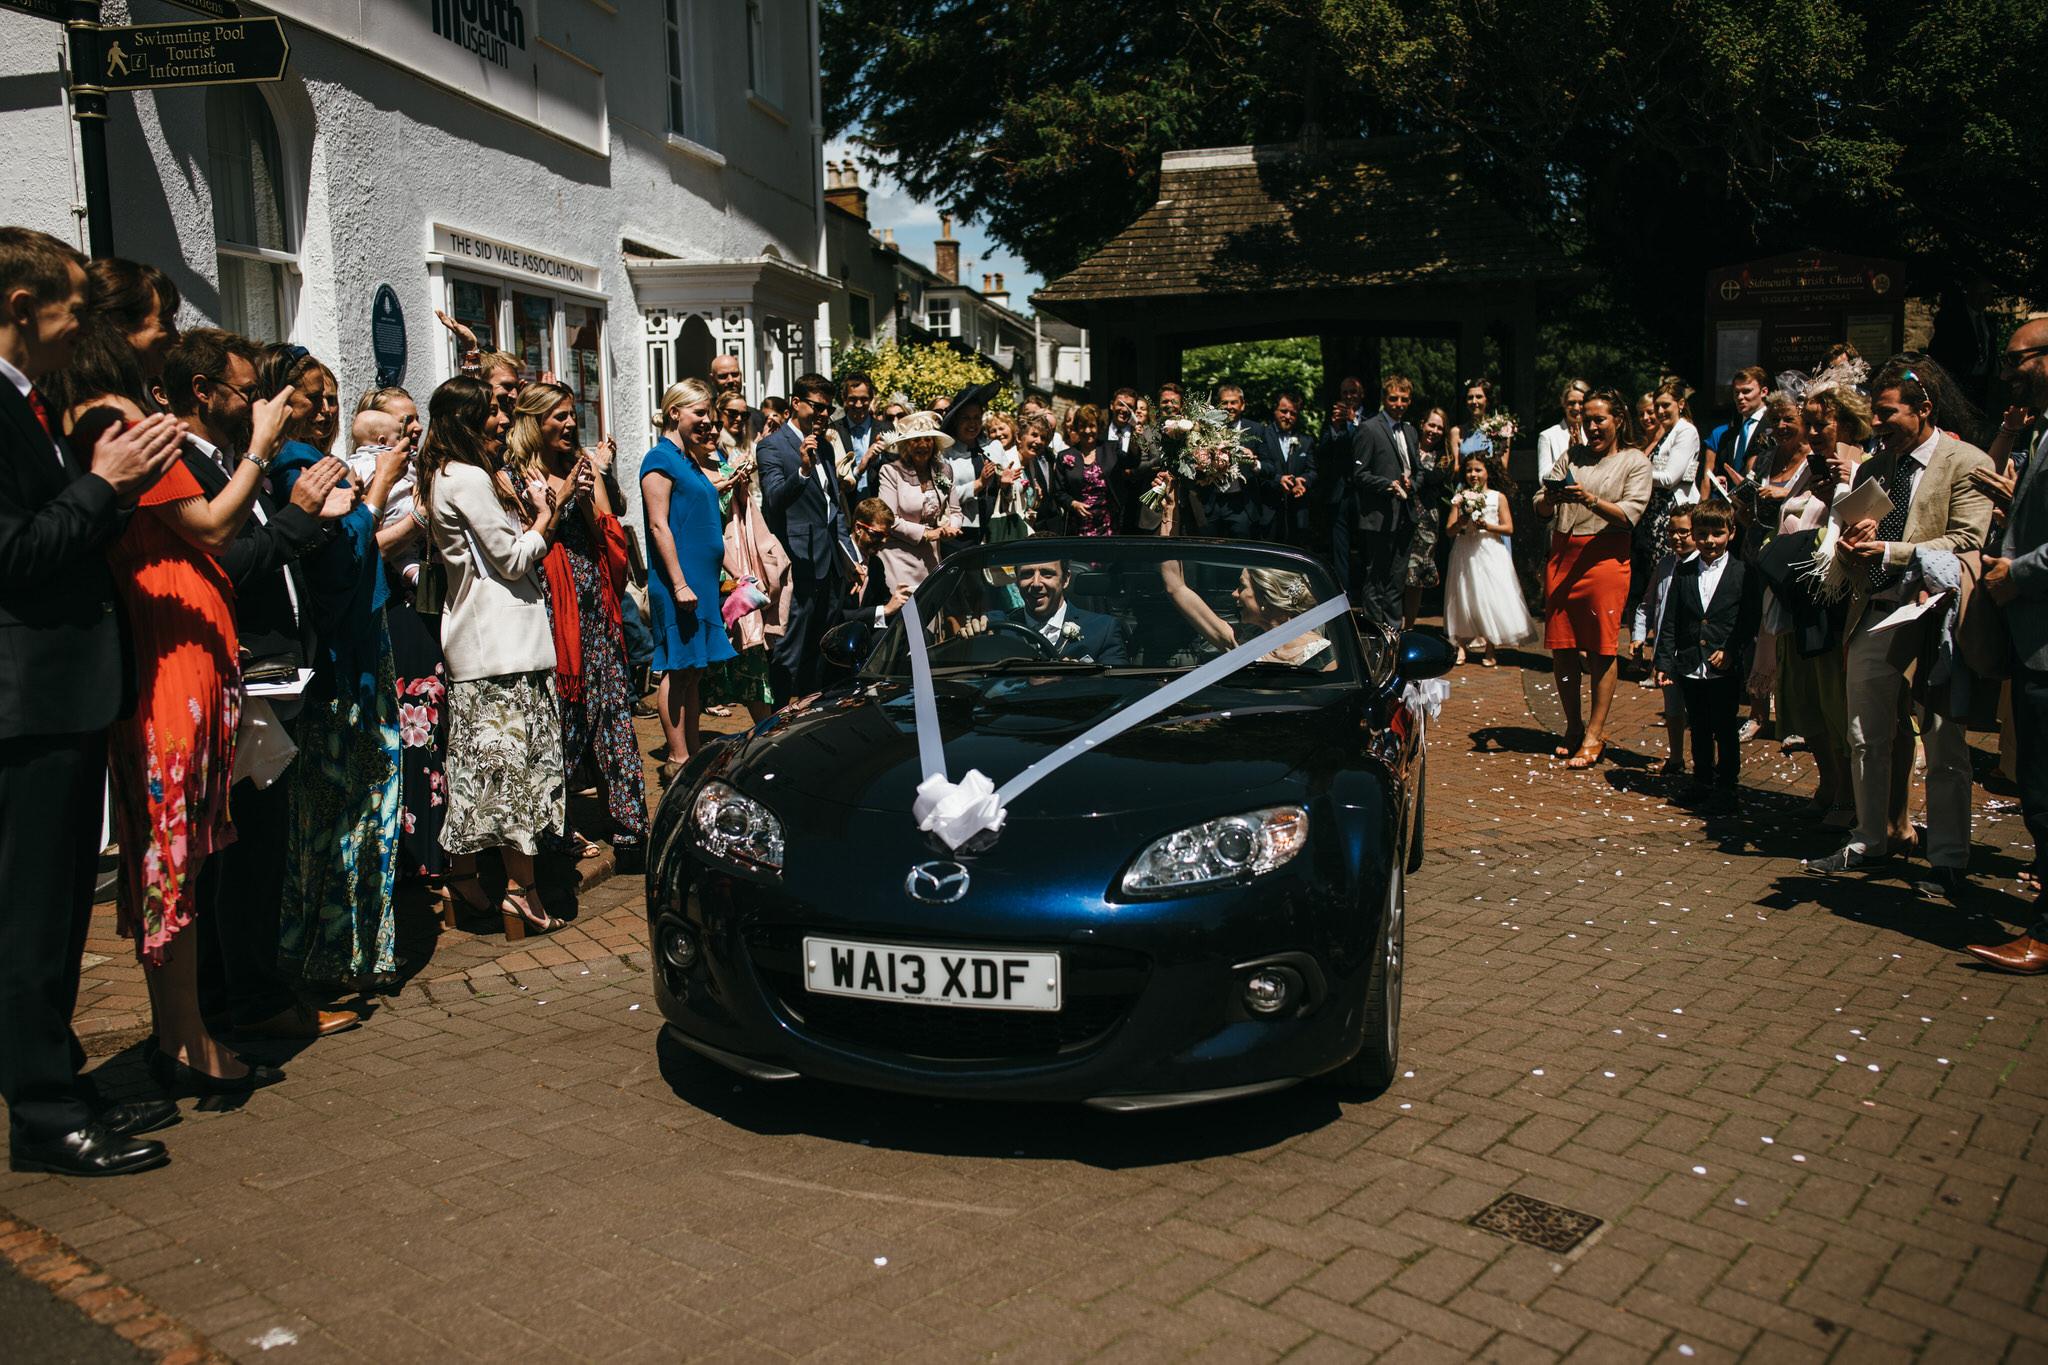 Wedding car getaway